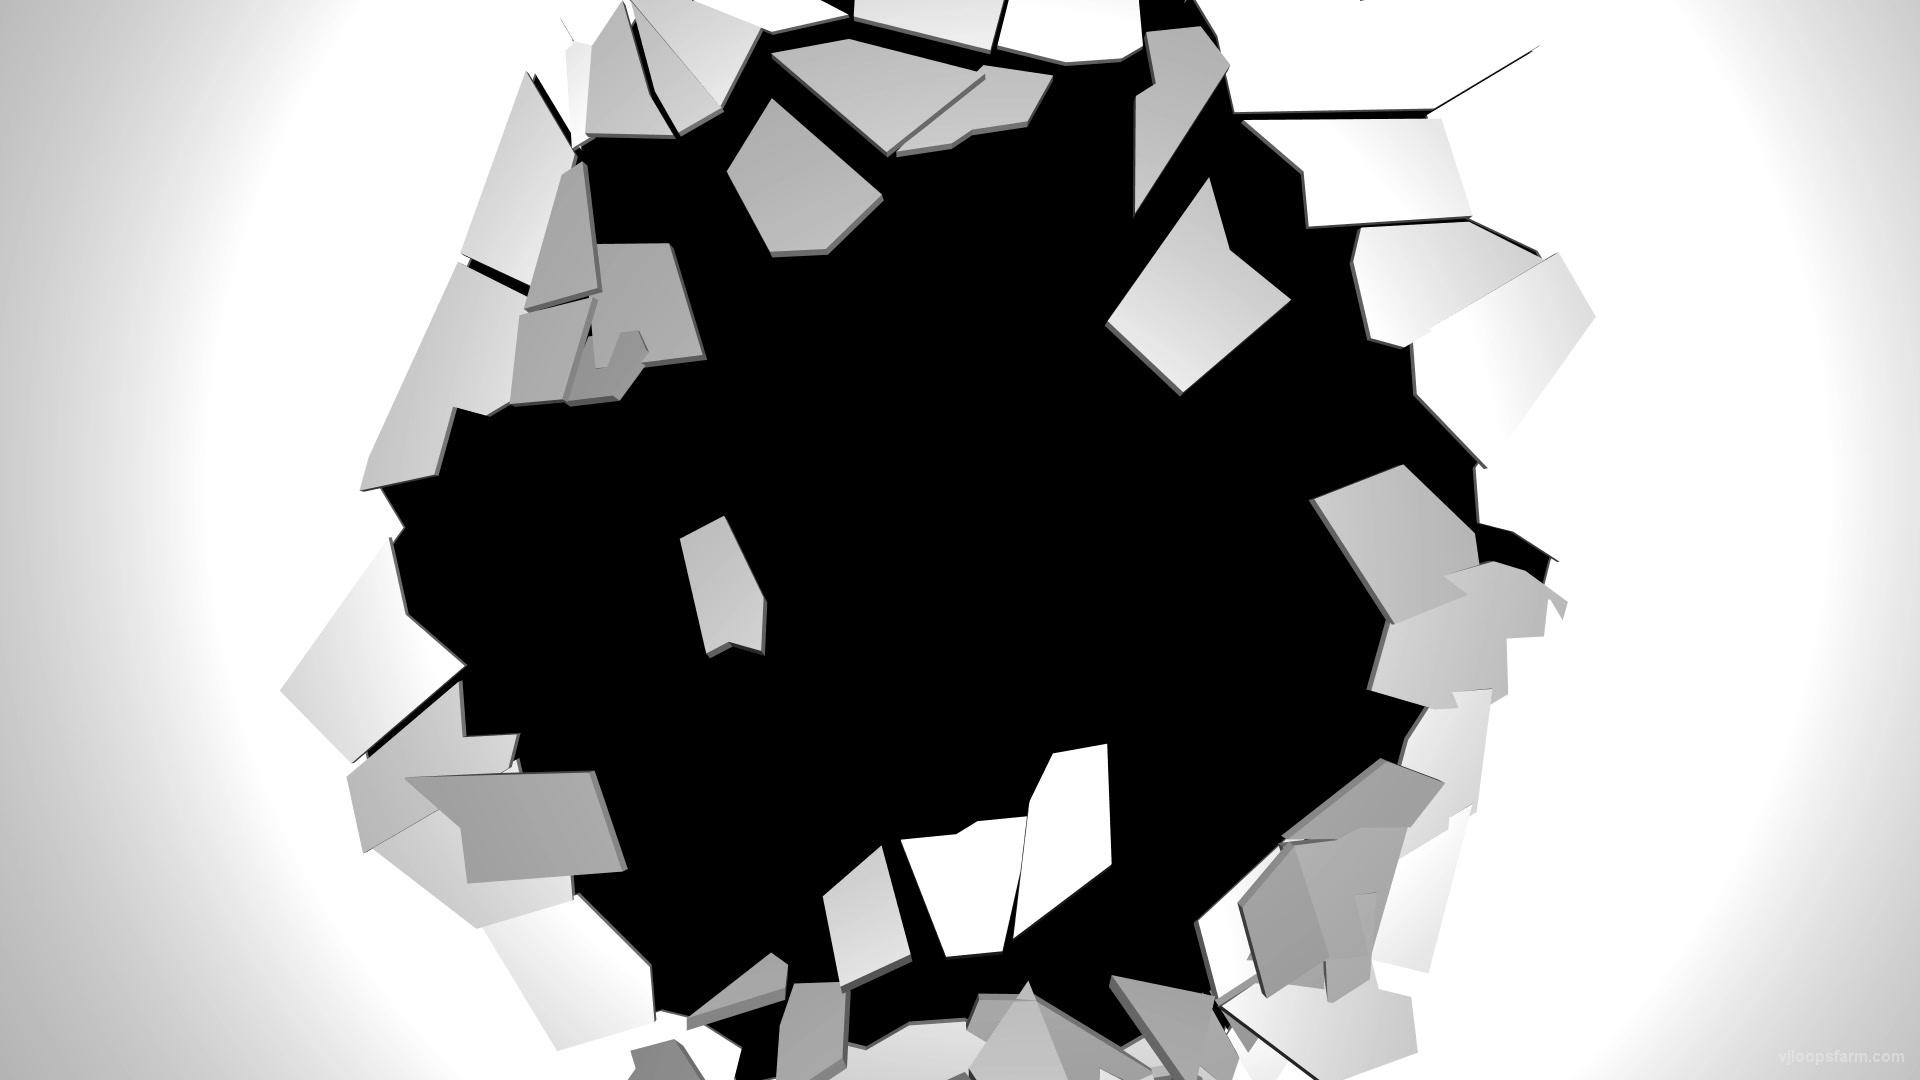 Crash Window Glass Fall desctuction impact visuals vj loop transition video    Download at VJ Loops Farm